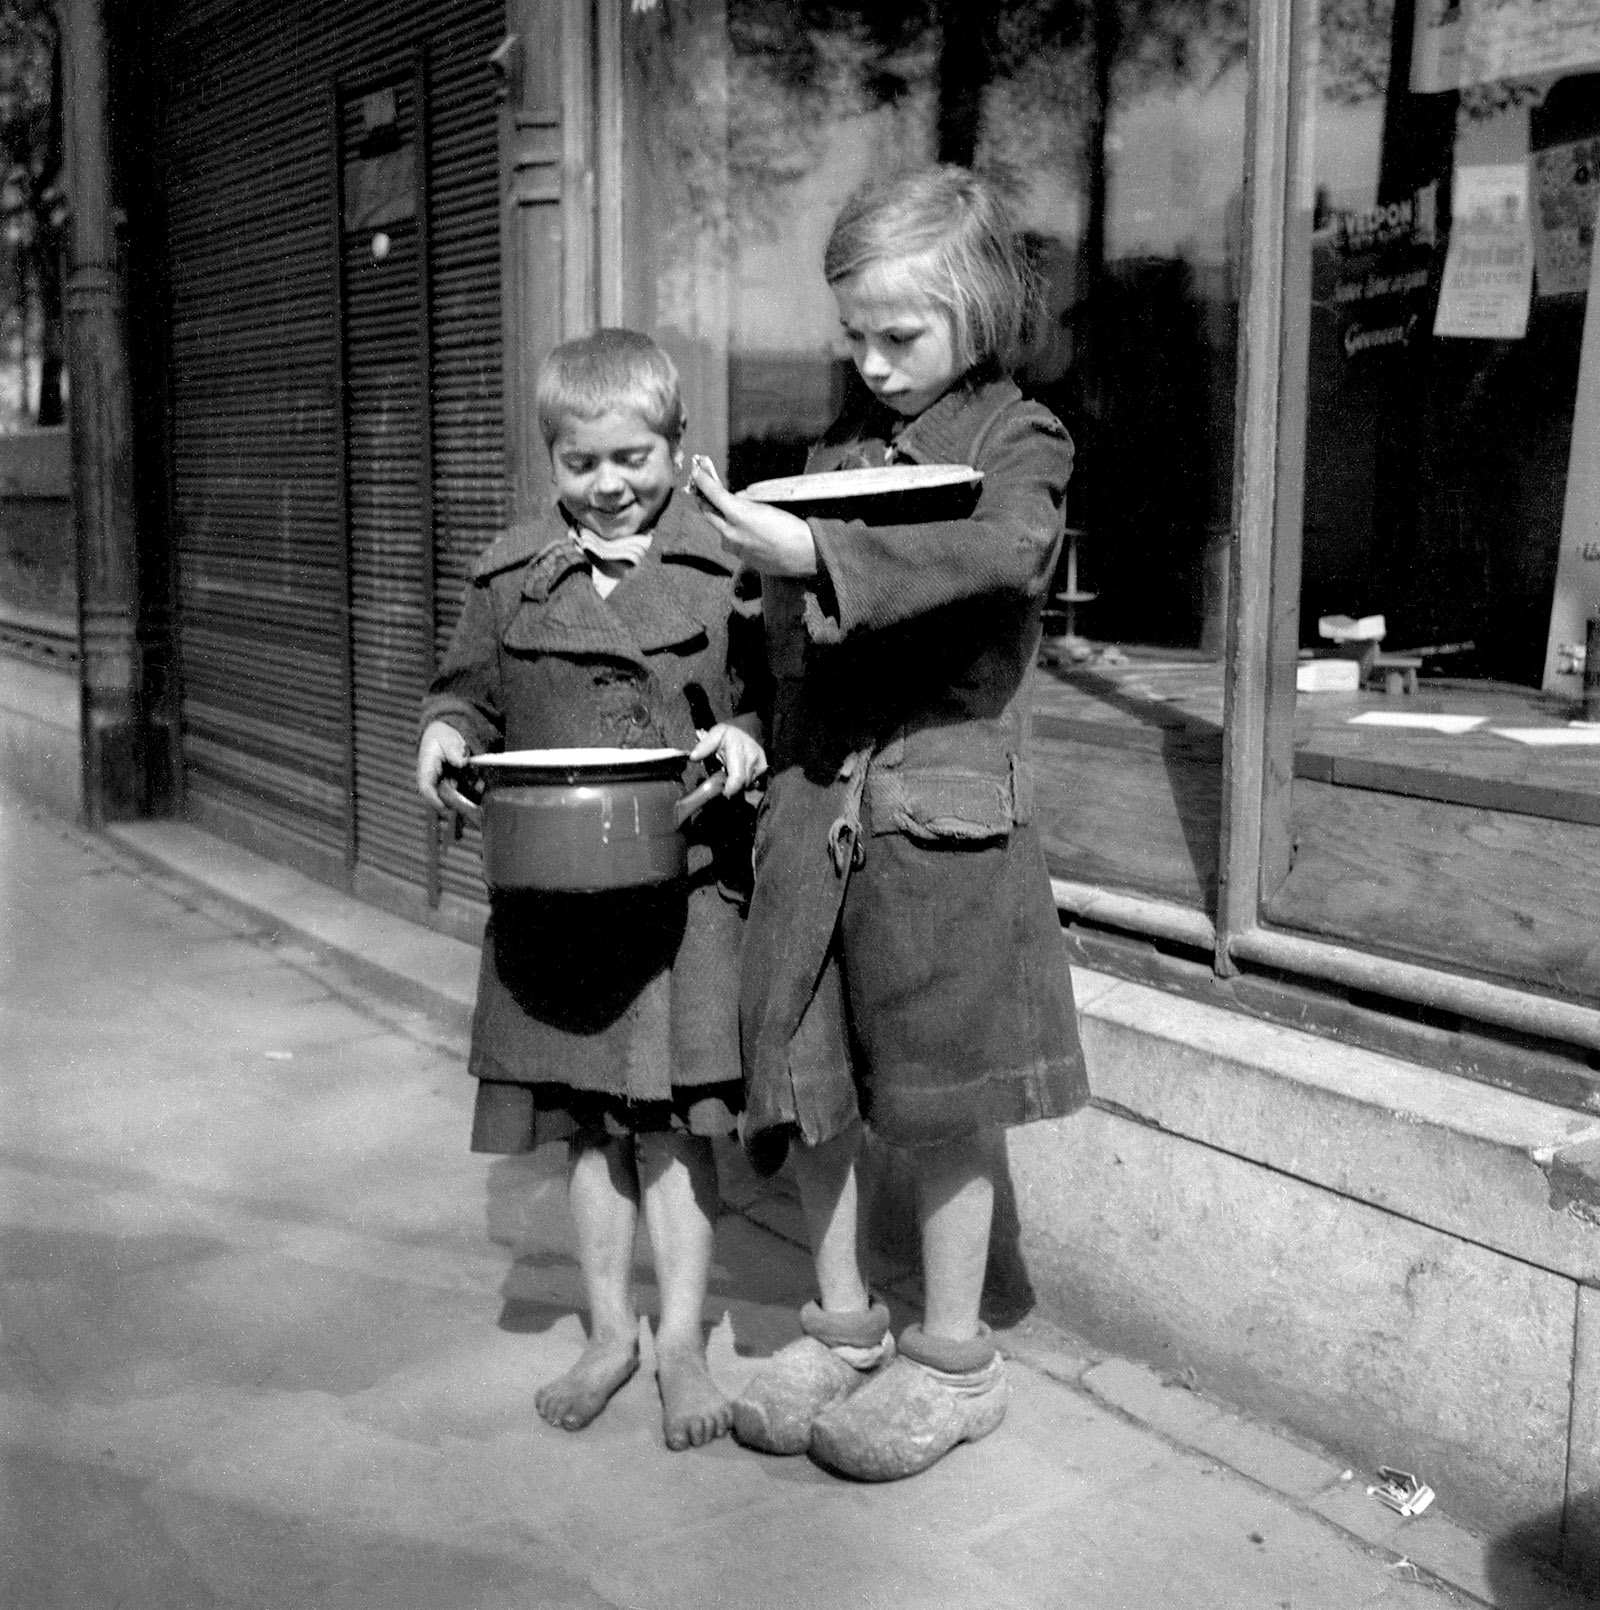 Children in Amsterdam during the Dutch Hunger Winter, 1944–1945